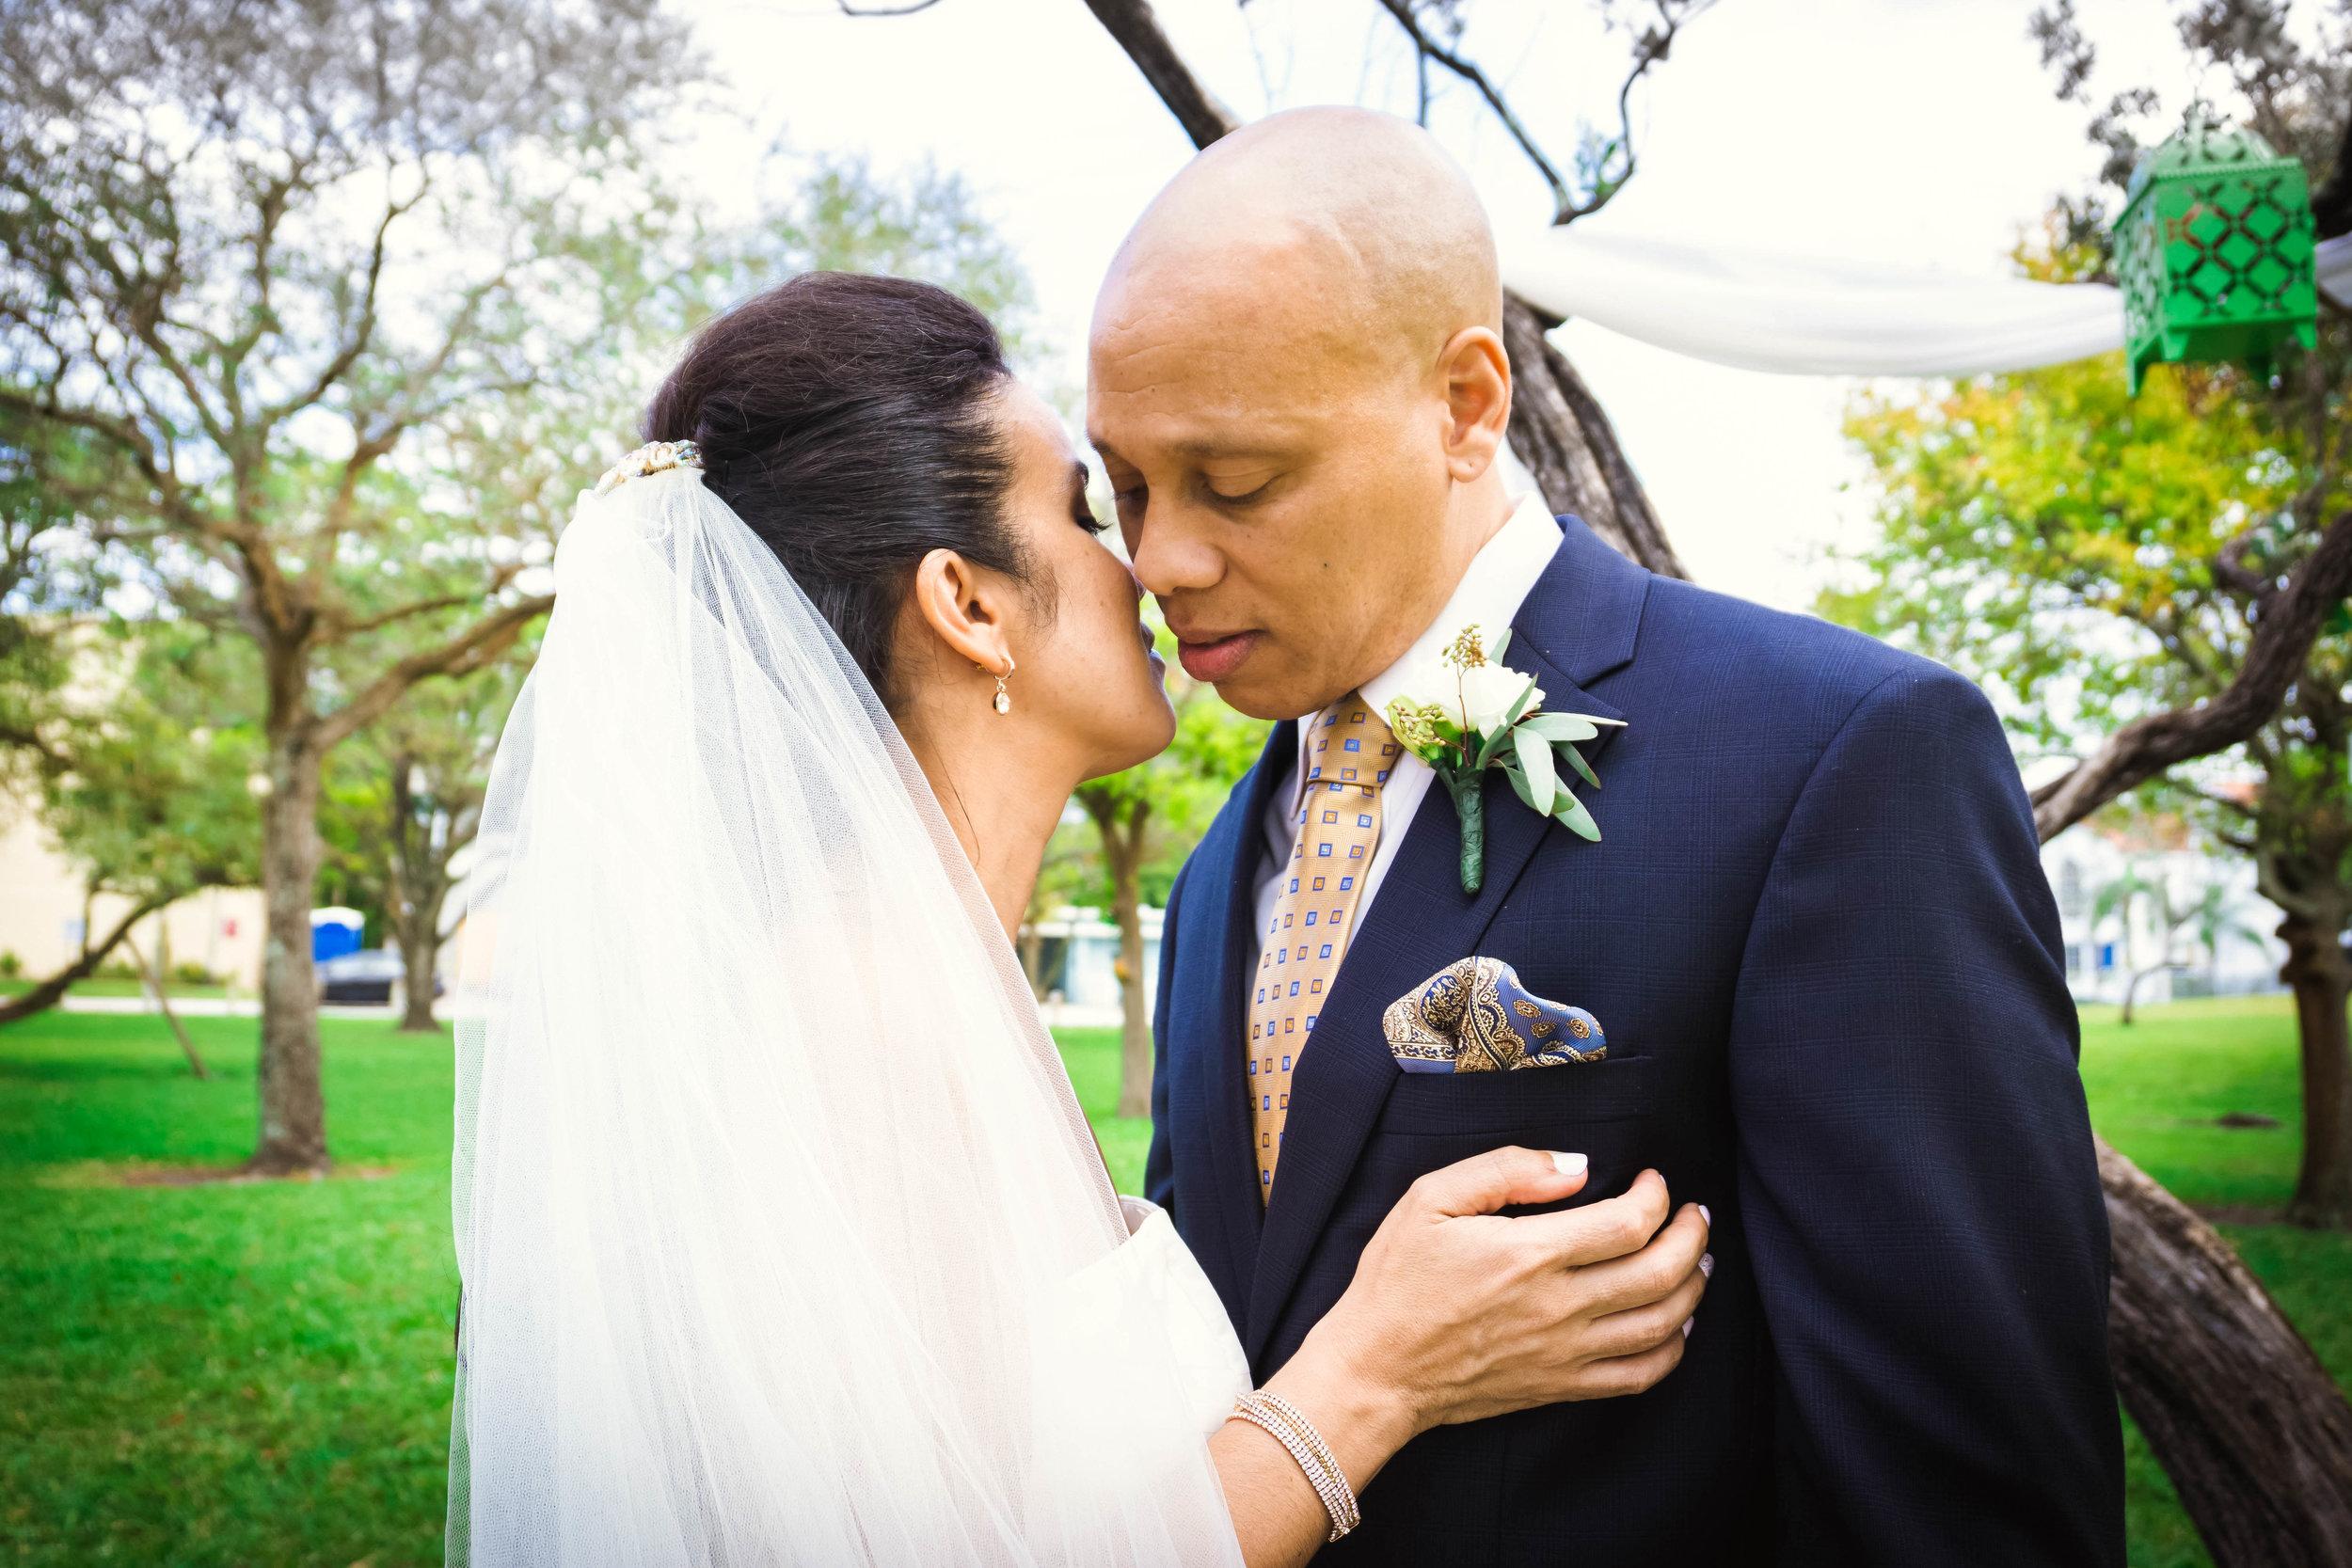 Tina_Mestre_Photography_Jas_Wedding_62.jpg